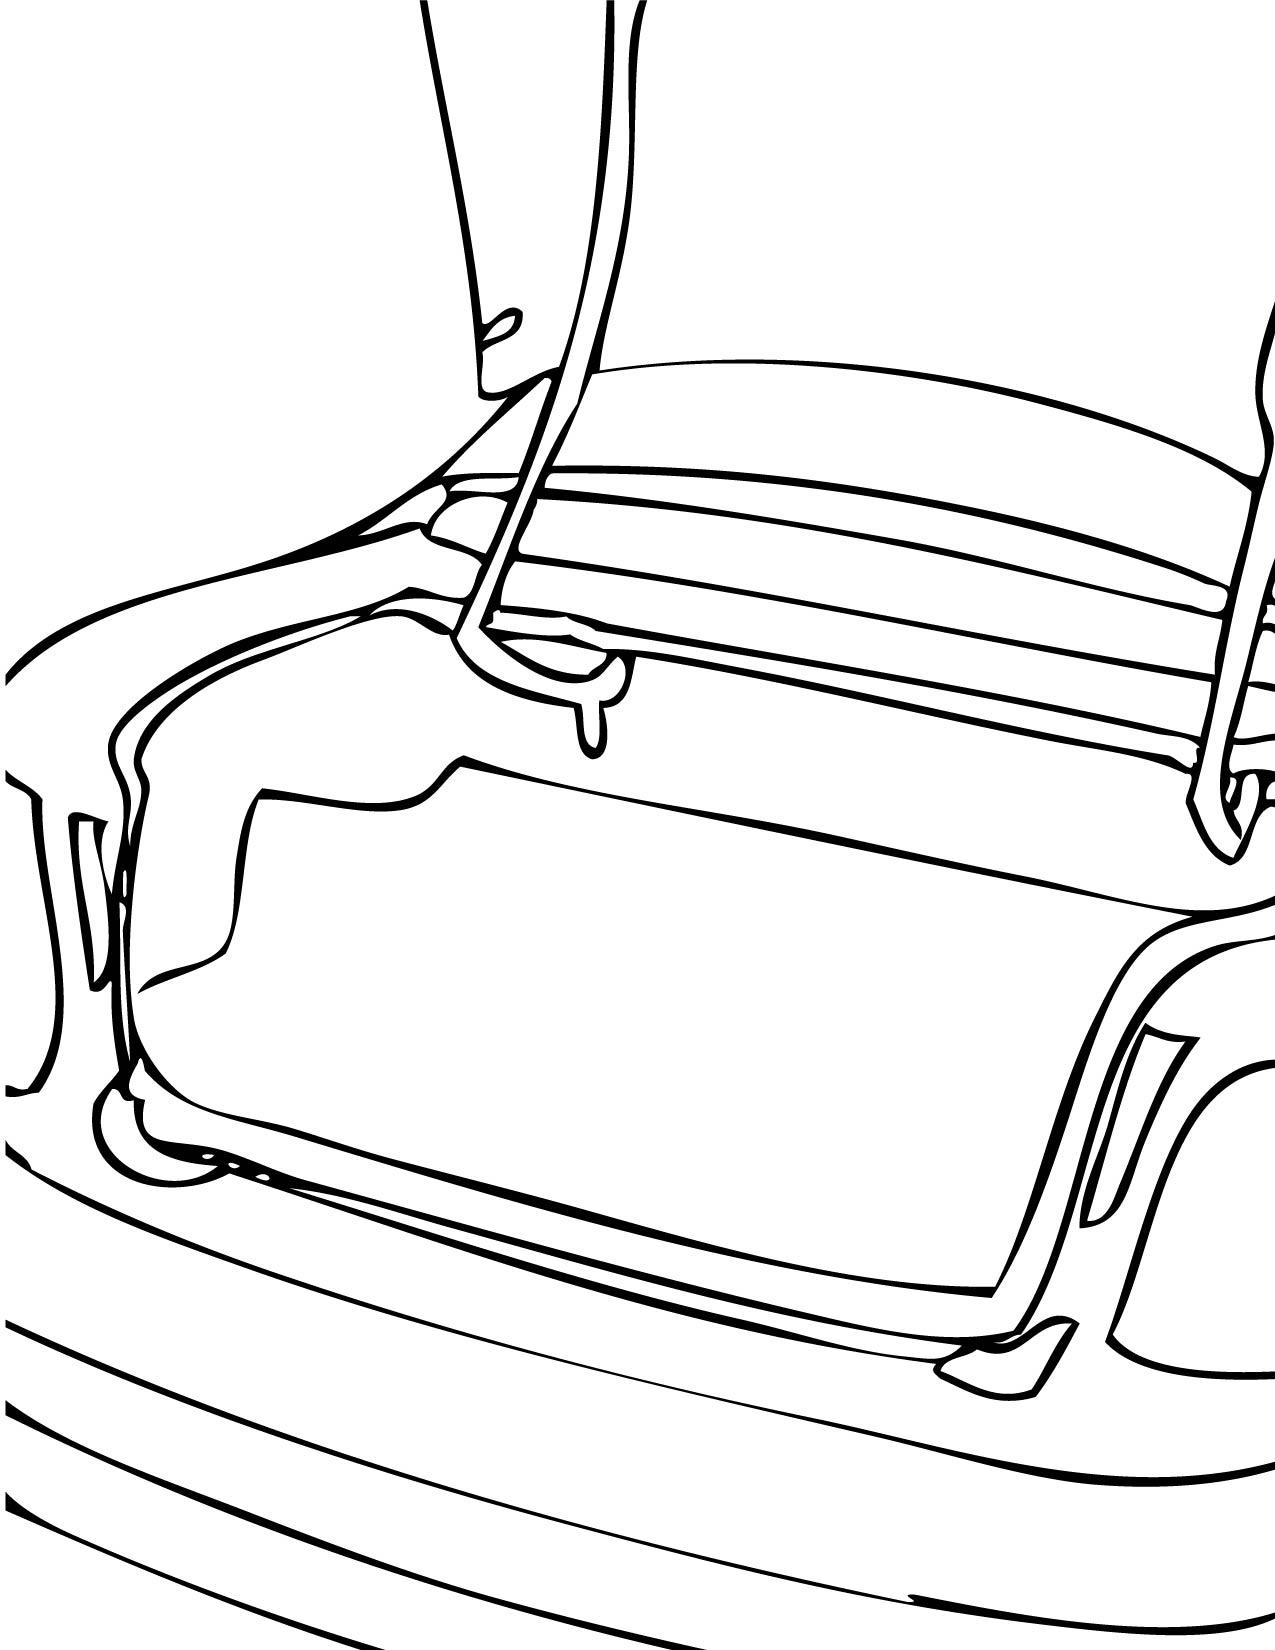 Car Parts Coloring Pages